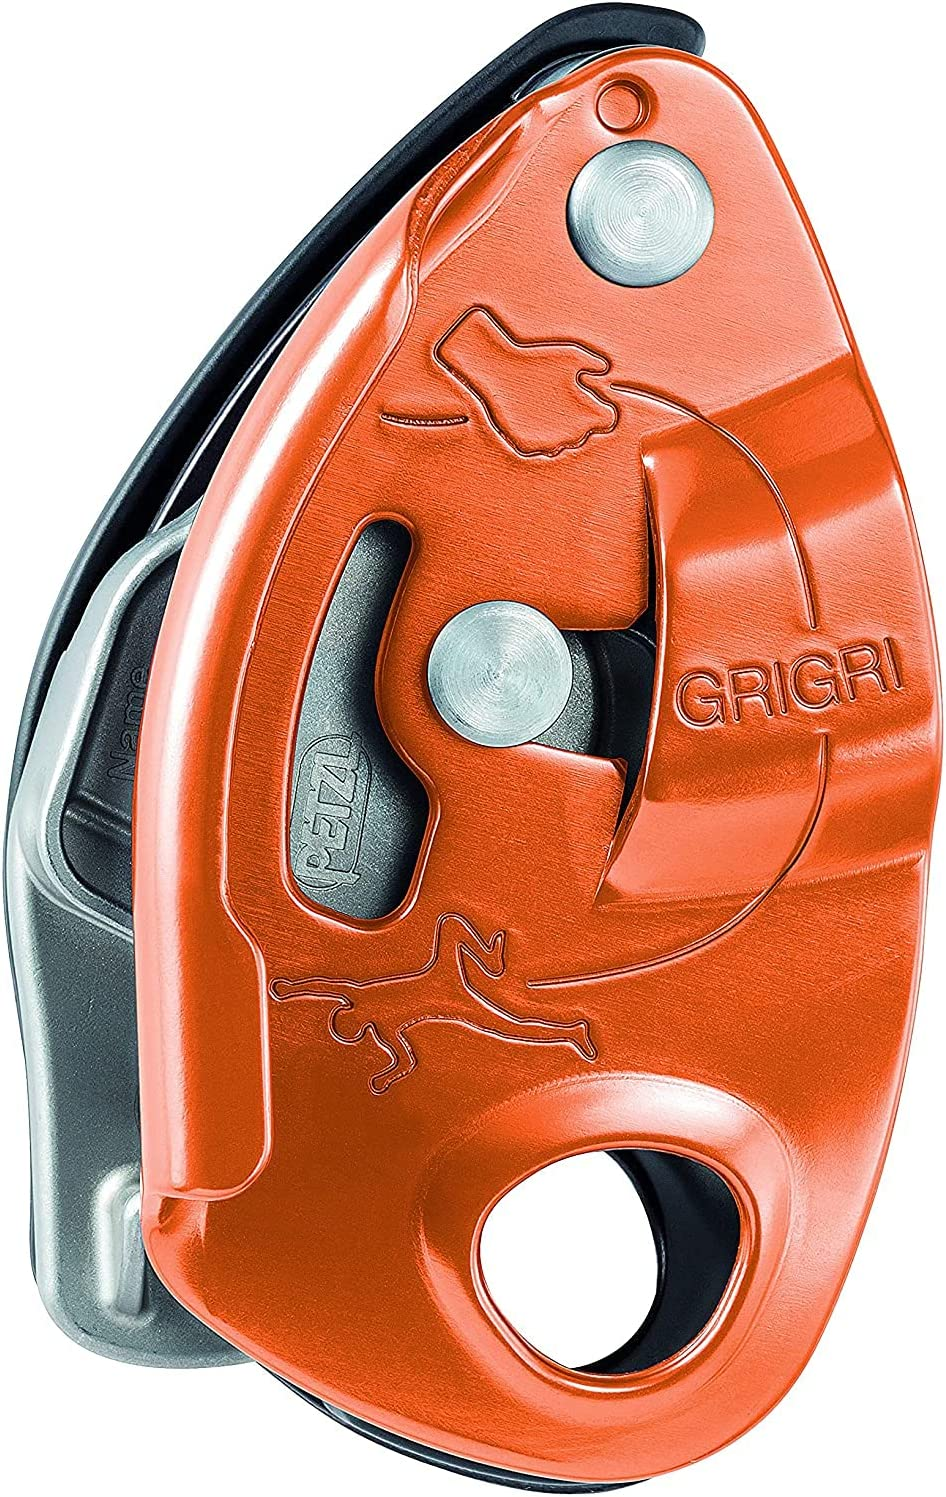 Petzl Red GRIGRI 3 Climbing Belay Device